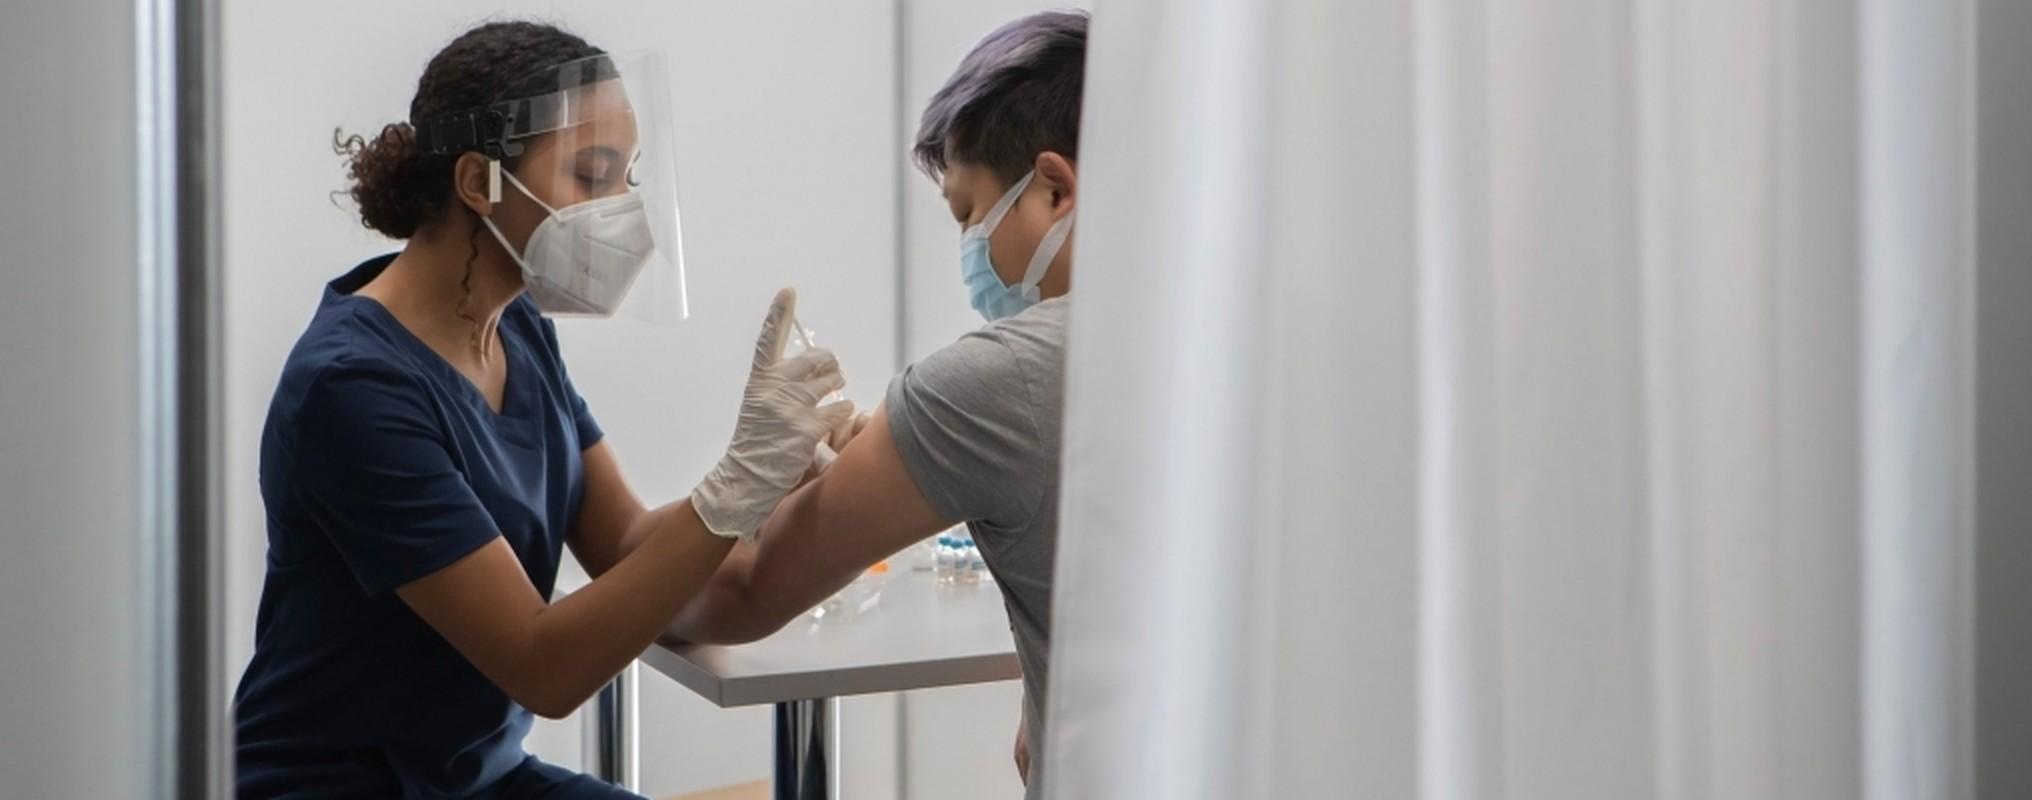 COVID-19: Tiem vac xin lieu 3, vi sao CDC chau Au khuyen khong can thiet?-Hinh-9